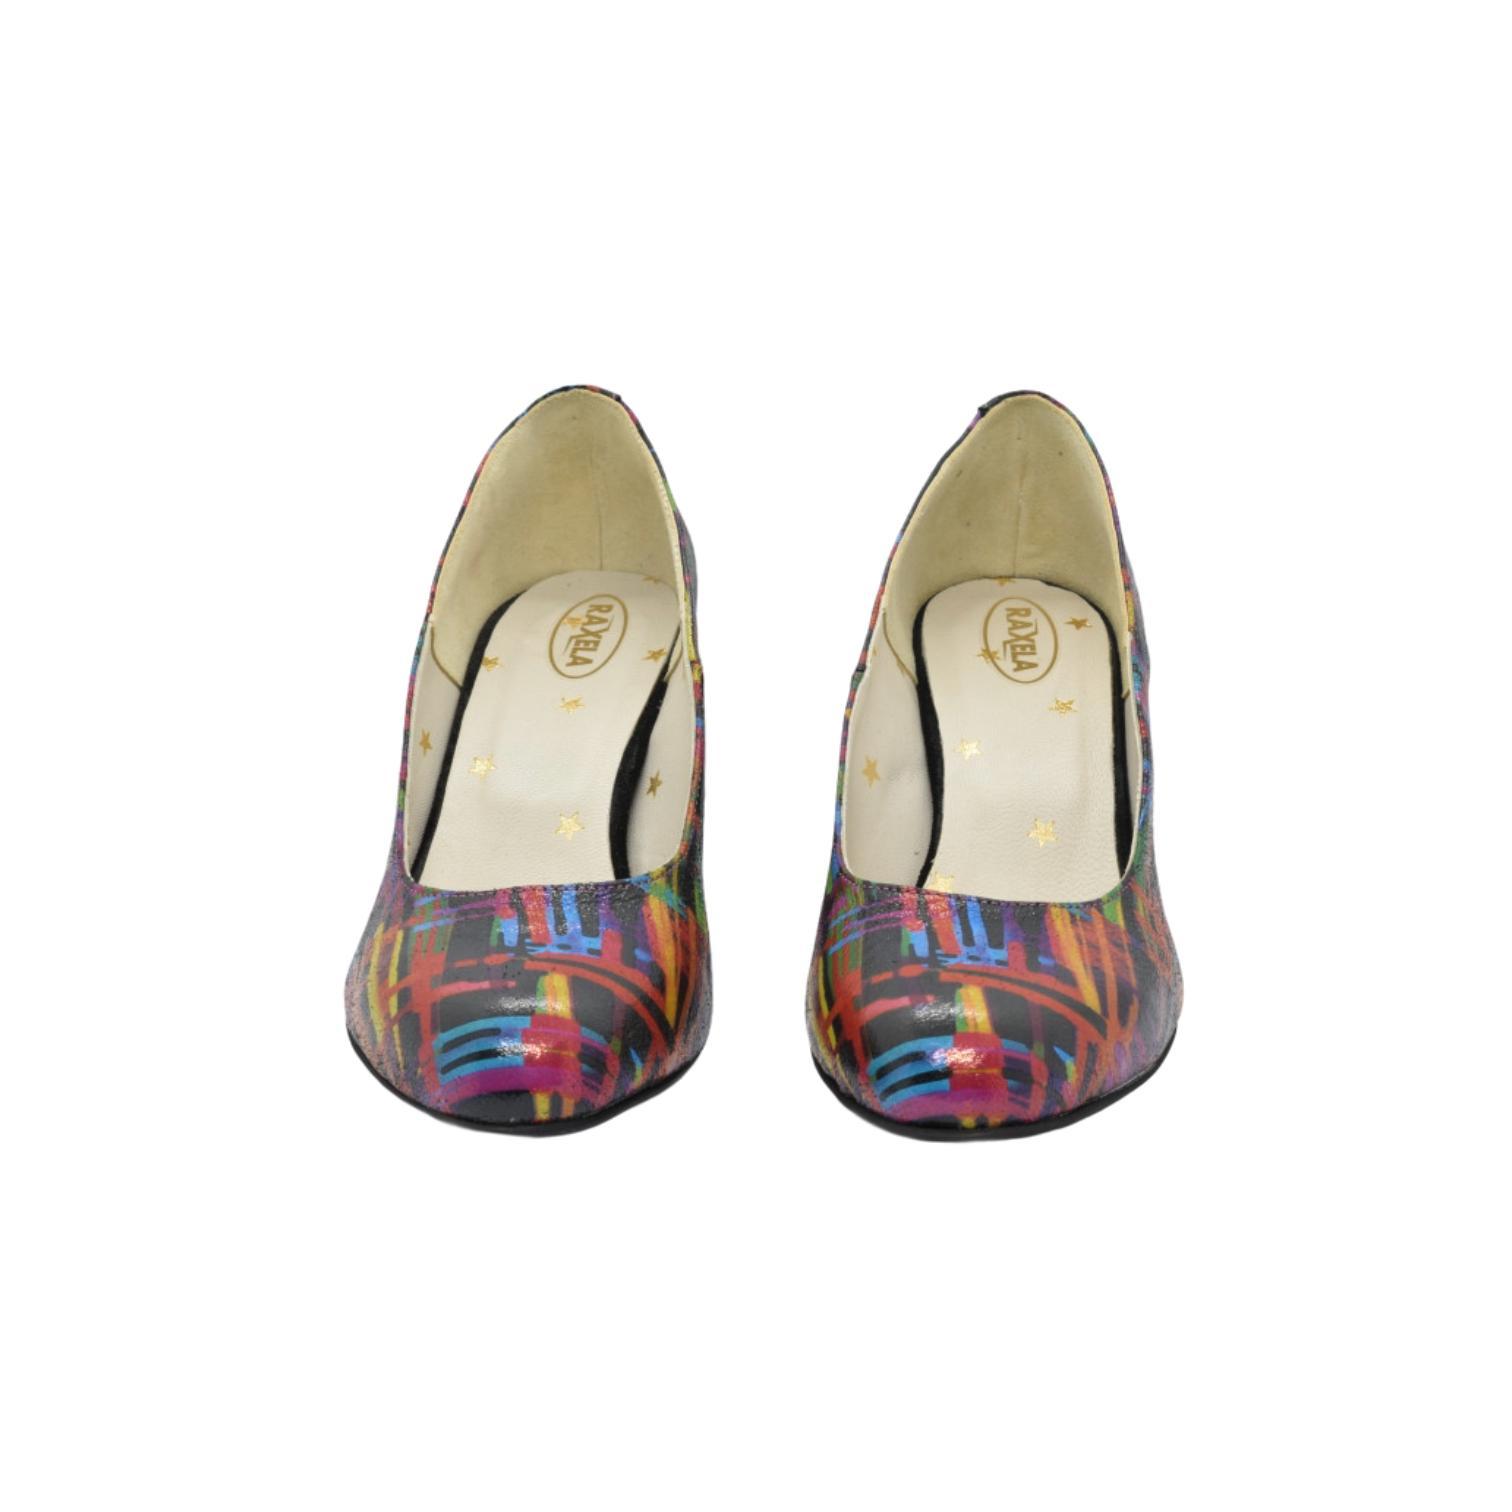 Pantofi multicolori cu model abstract